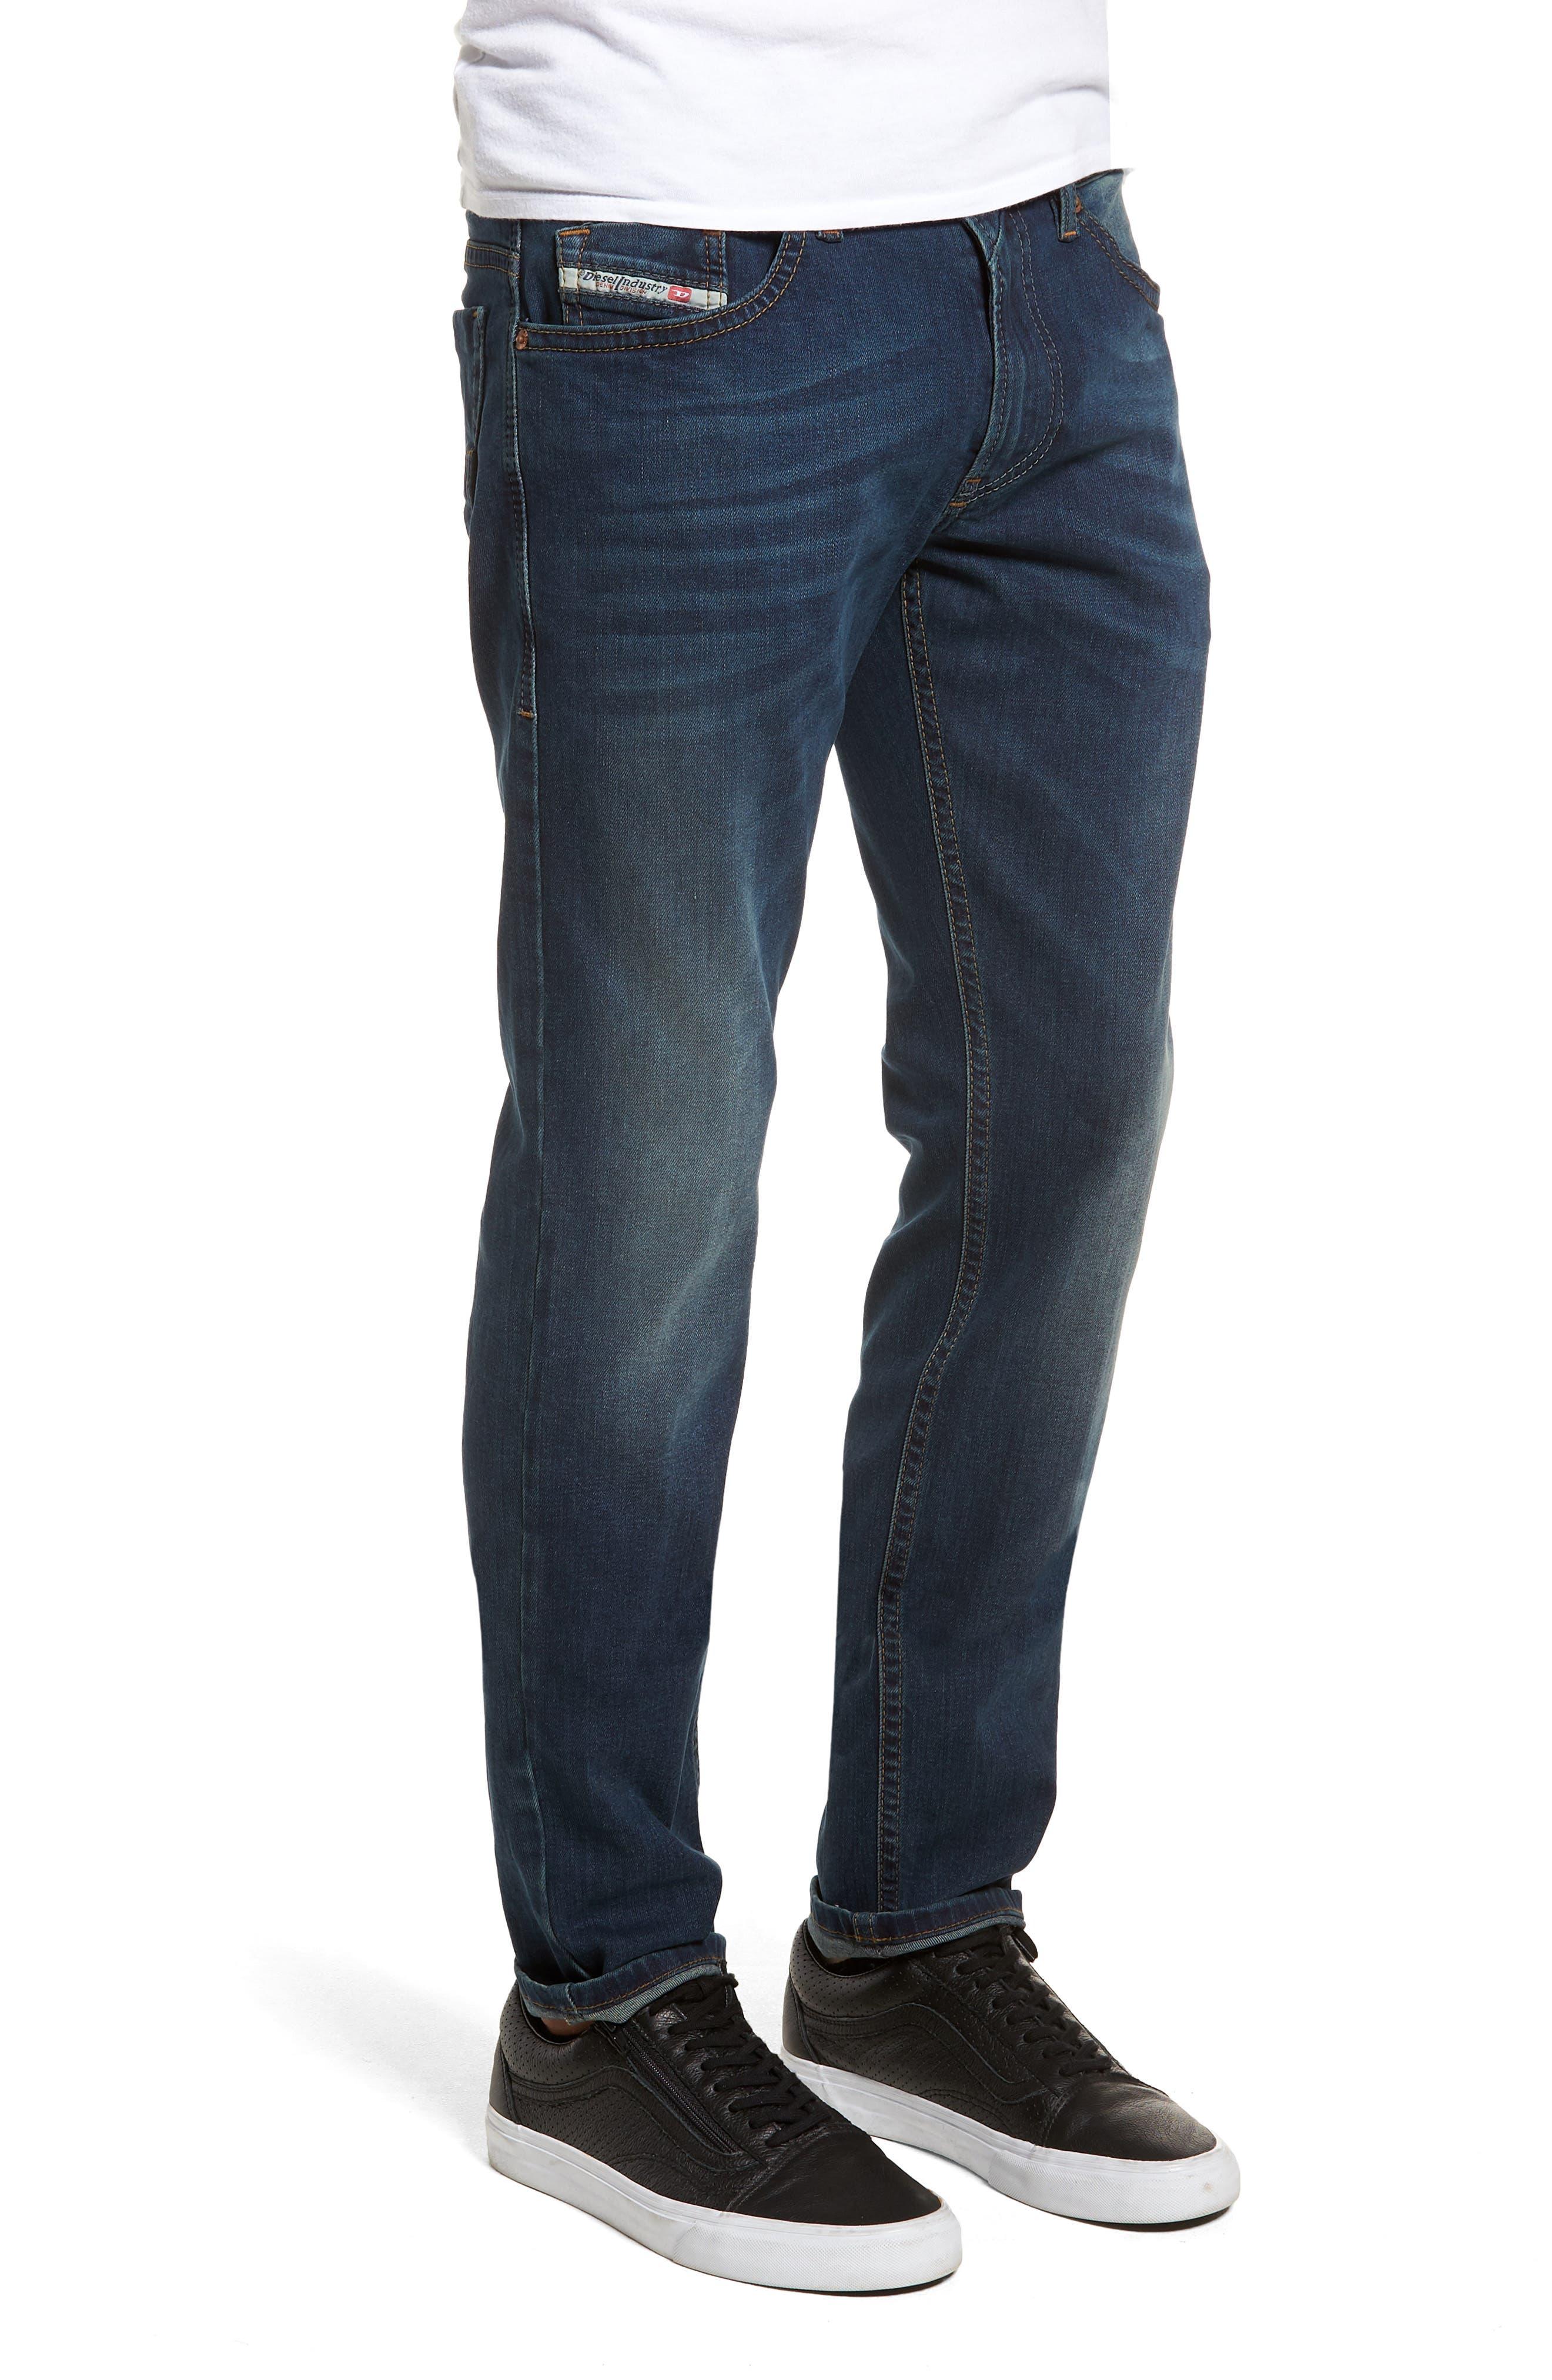 Thommer Skinny Fit Jeans,                             Alternate thumbnail 3, color,                             Blue